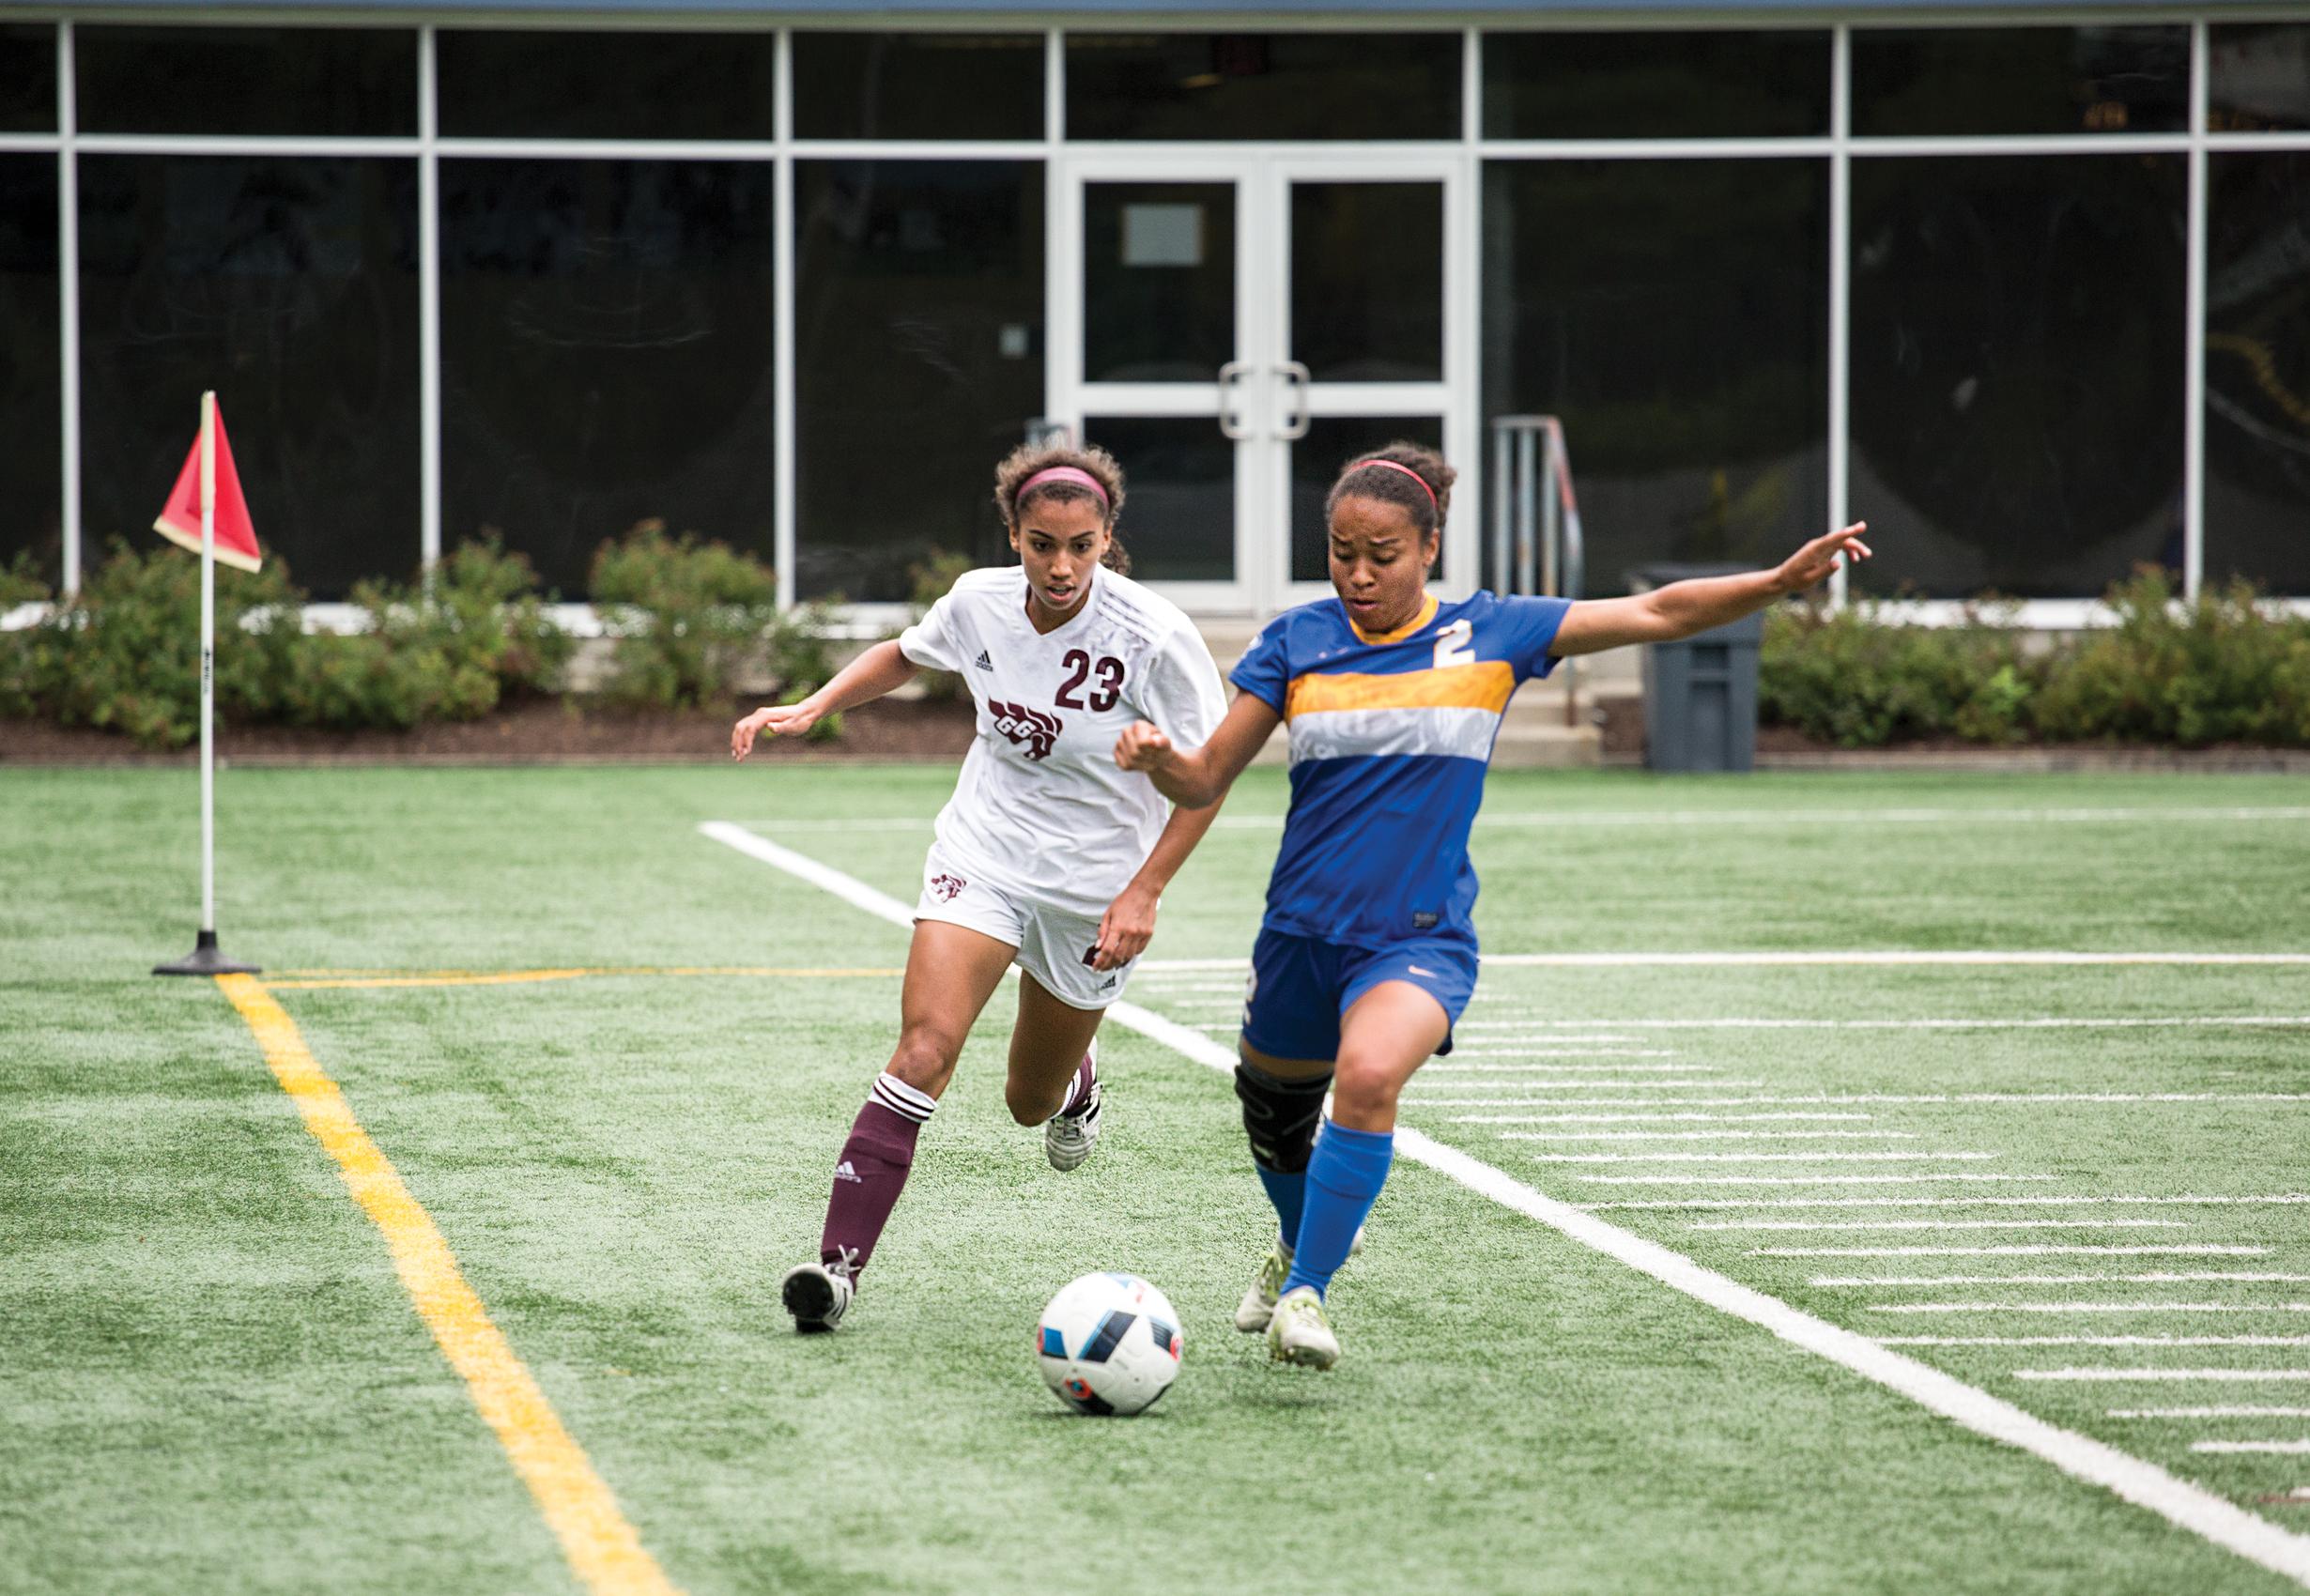 web_spo_womens_soccer_2_cred_jaclyn_mcrae-sadik